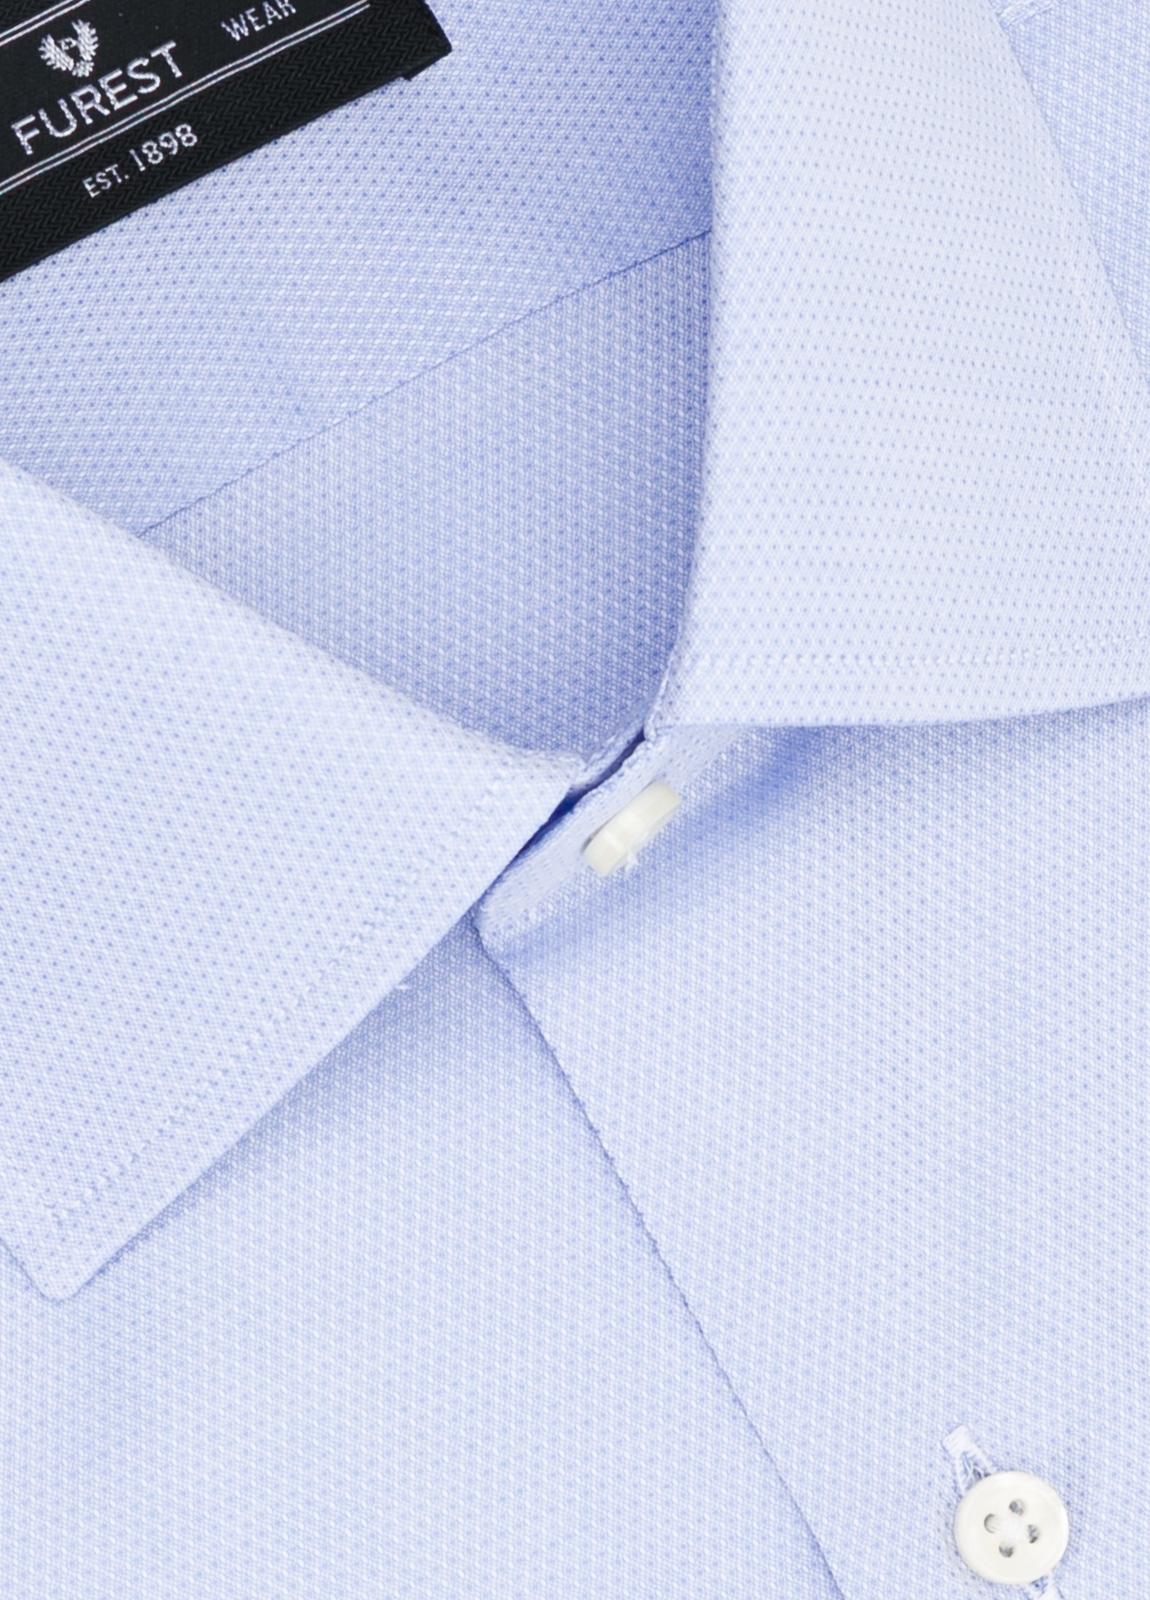 Camisa Formal Wear SLIM FIT cuello italiano modelo ROMA micro grabado color celeste, 100% Algodón. - Ítem1